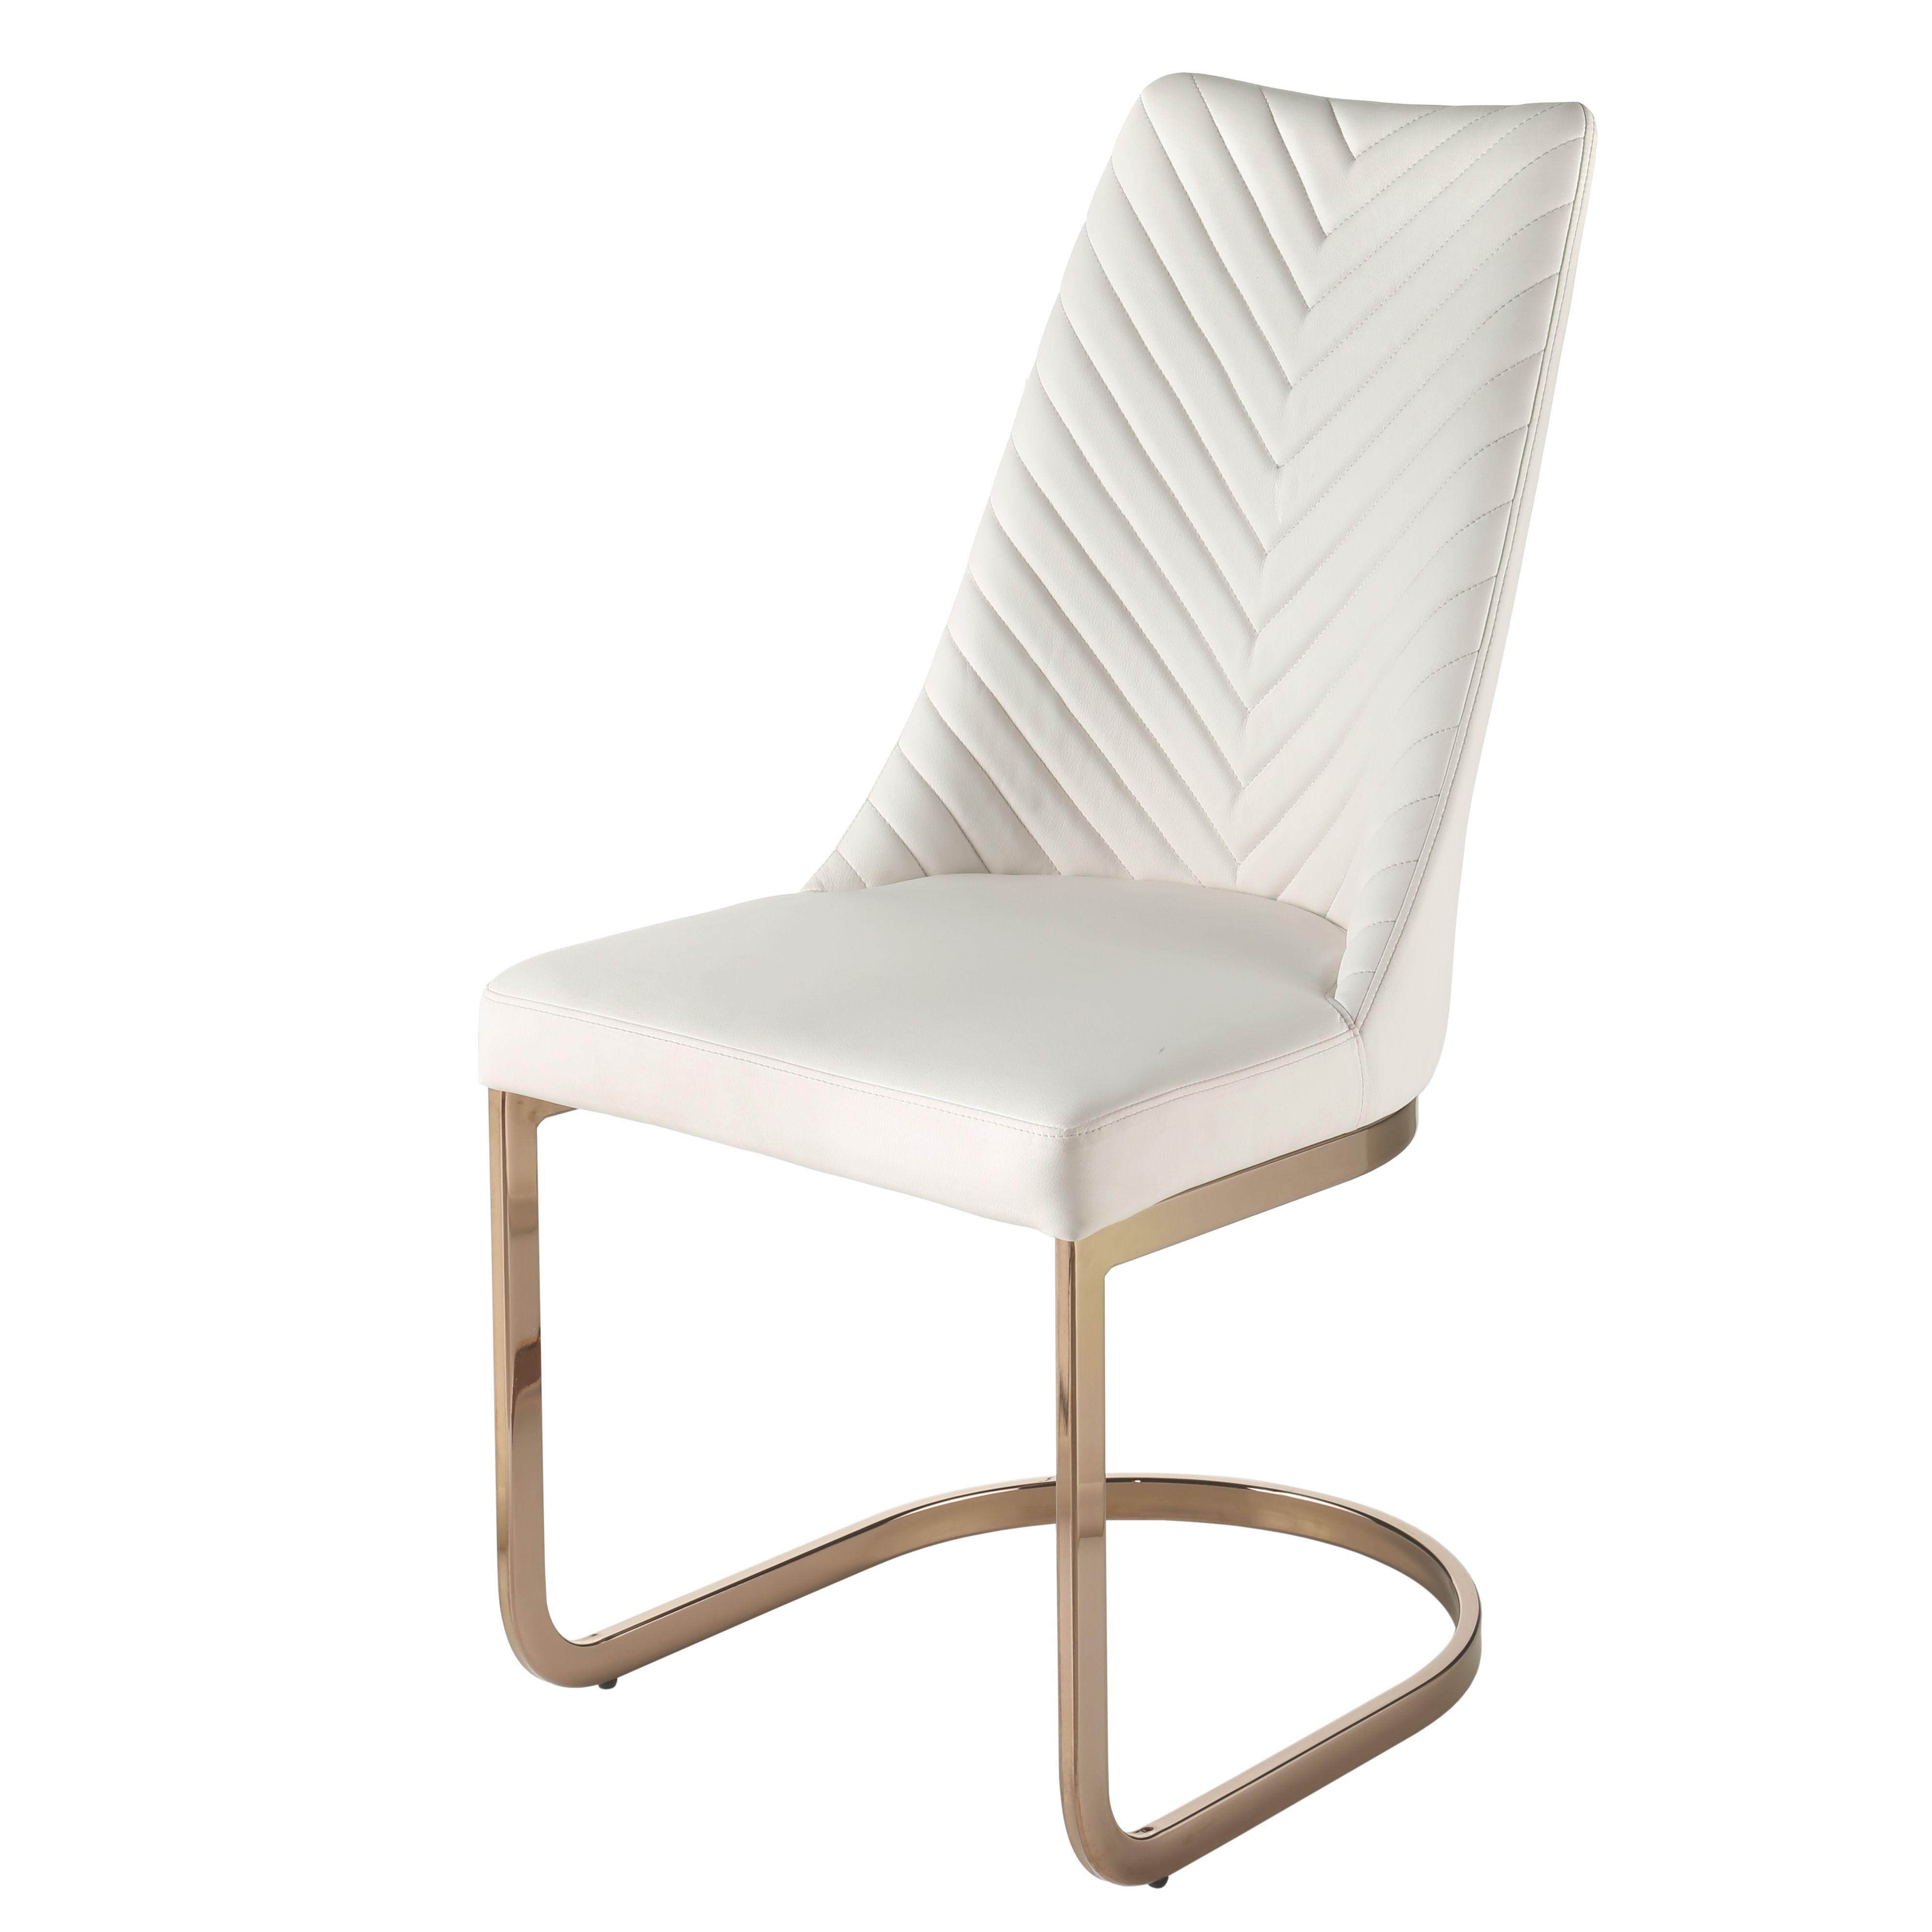 Kyla KD PU Chair Rose Gold Legs in White NPD